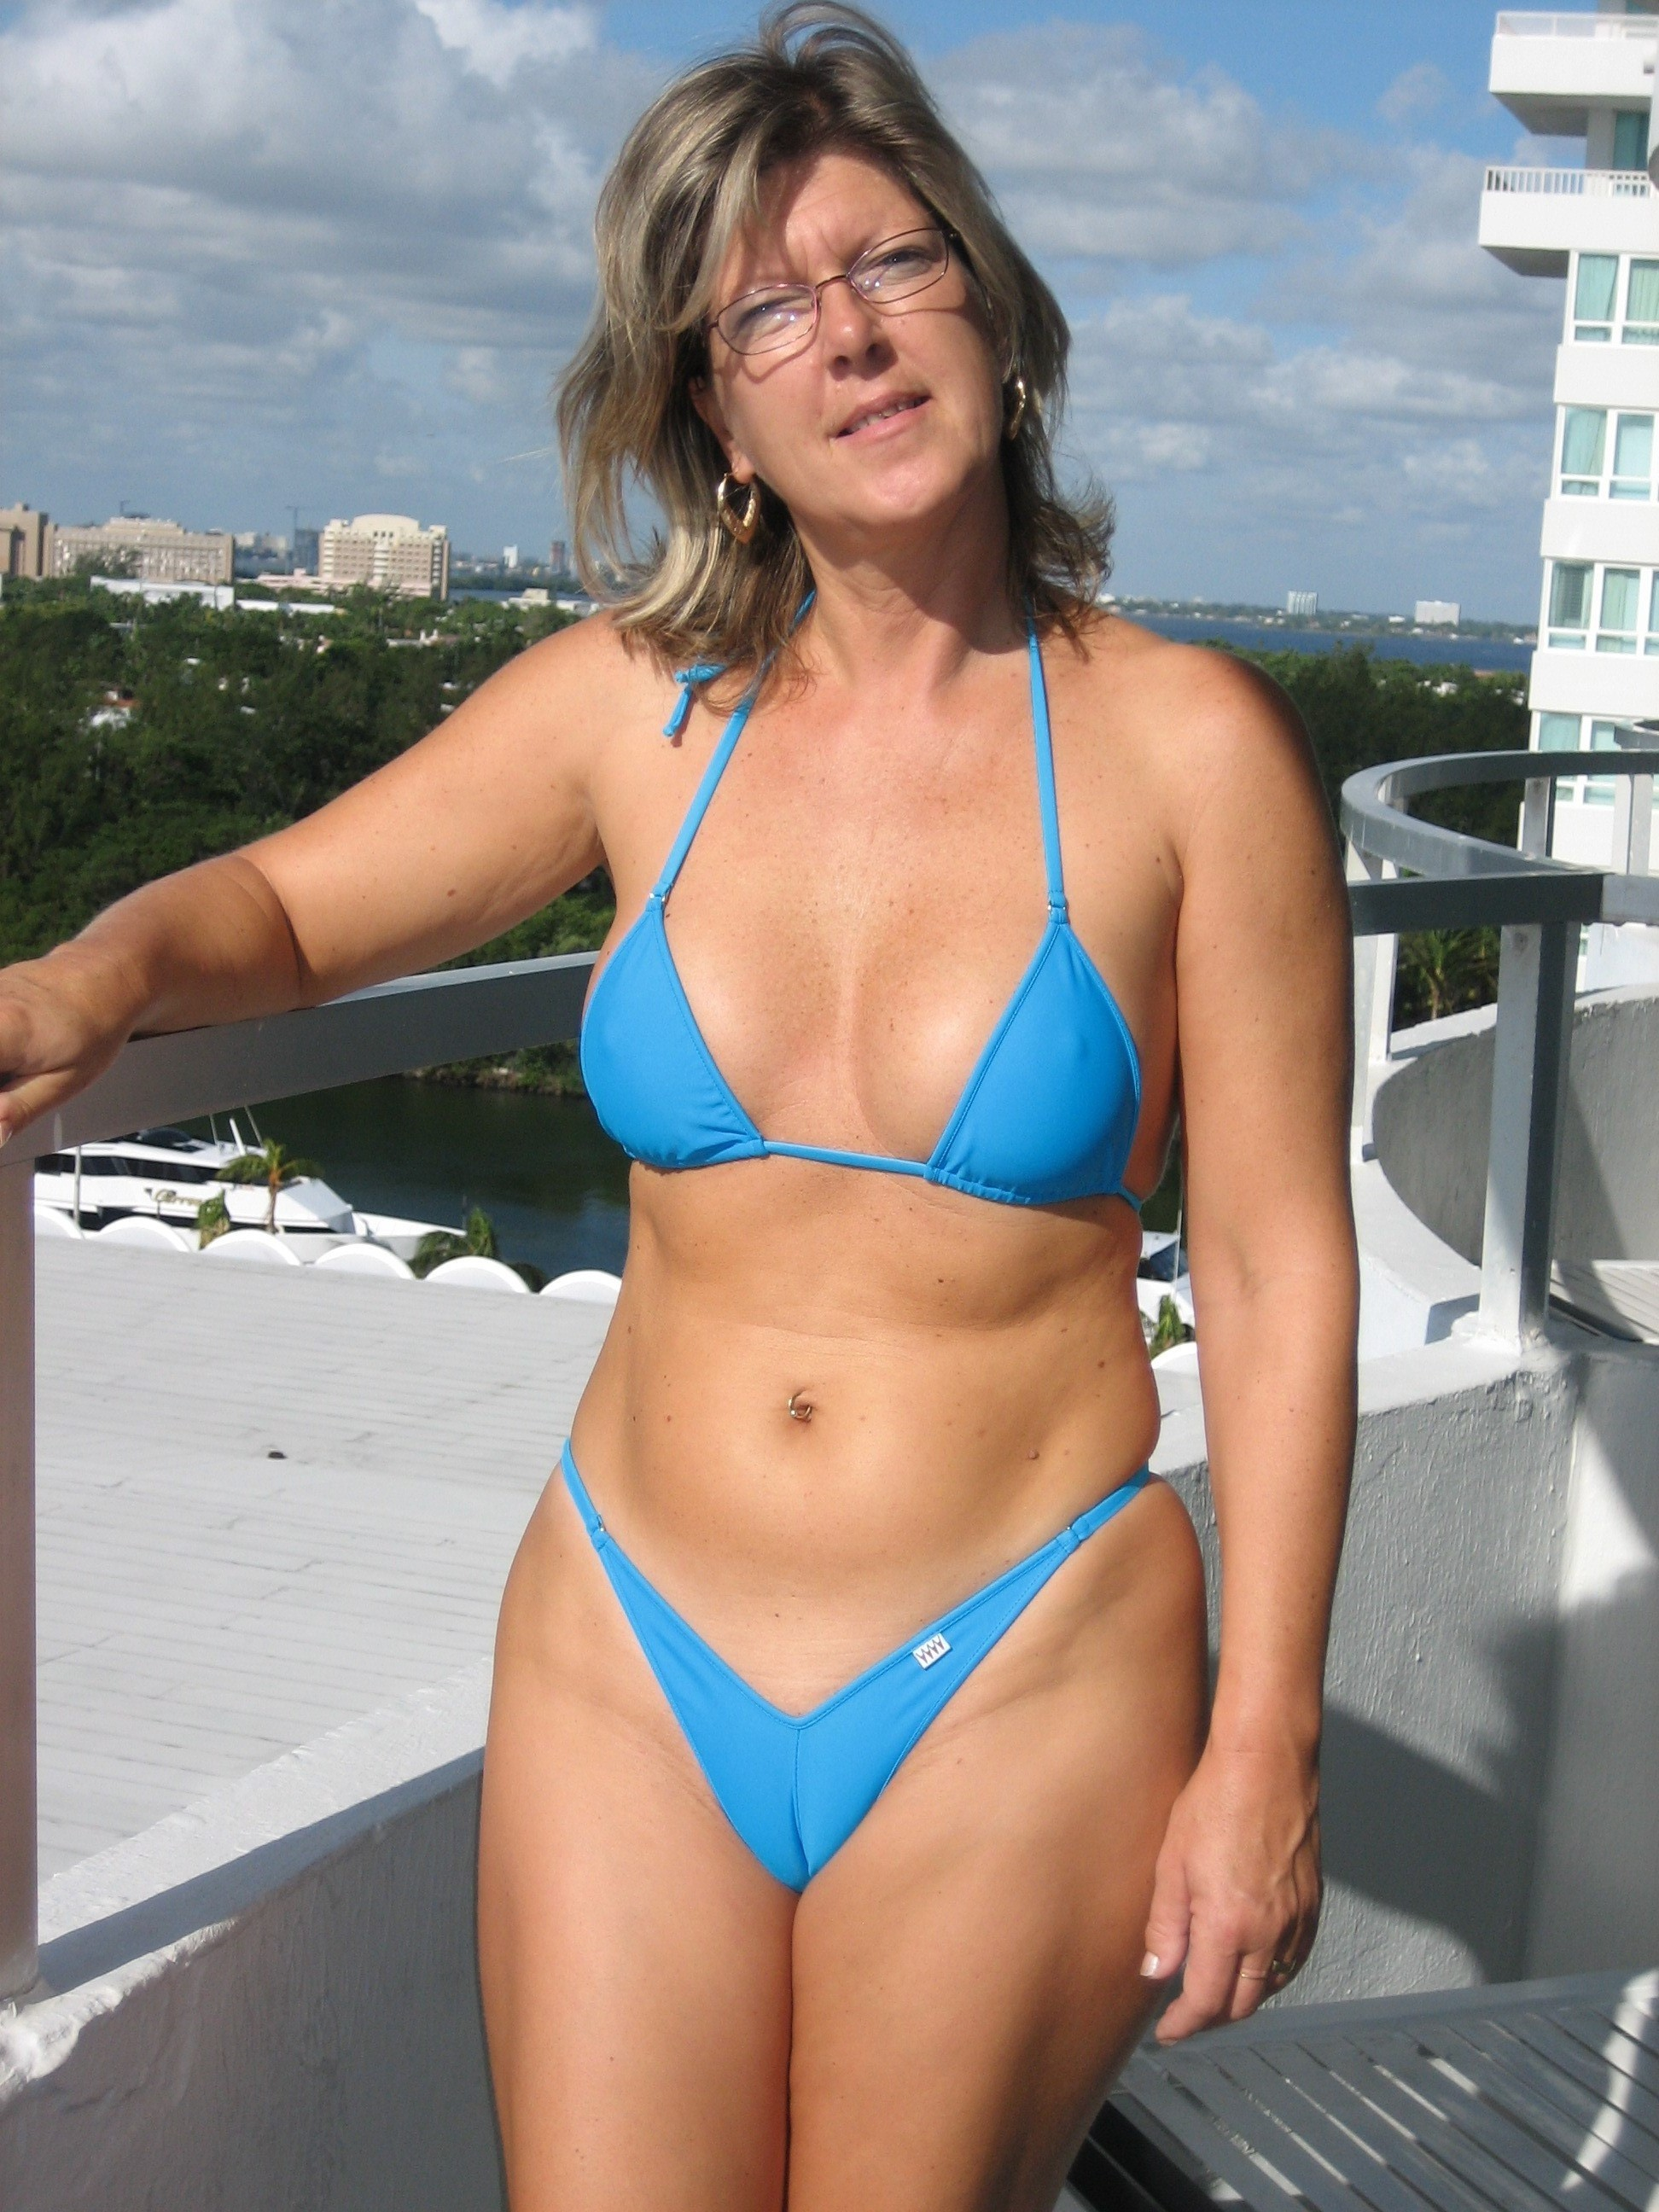 milf with glasses in a skimpy little bikini